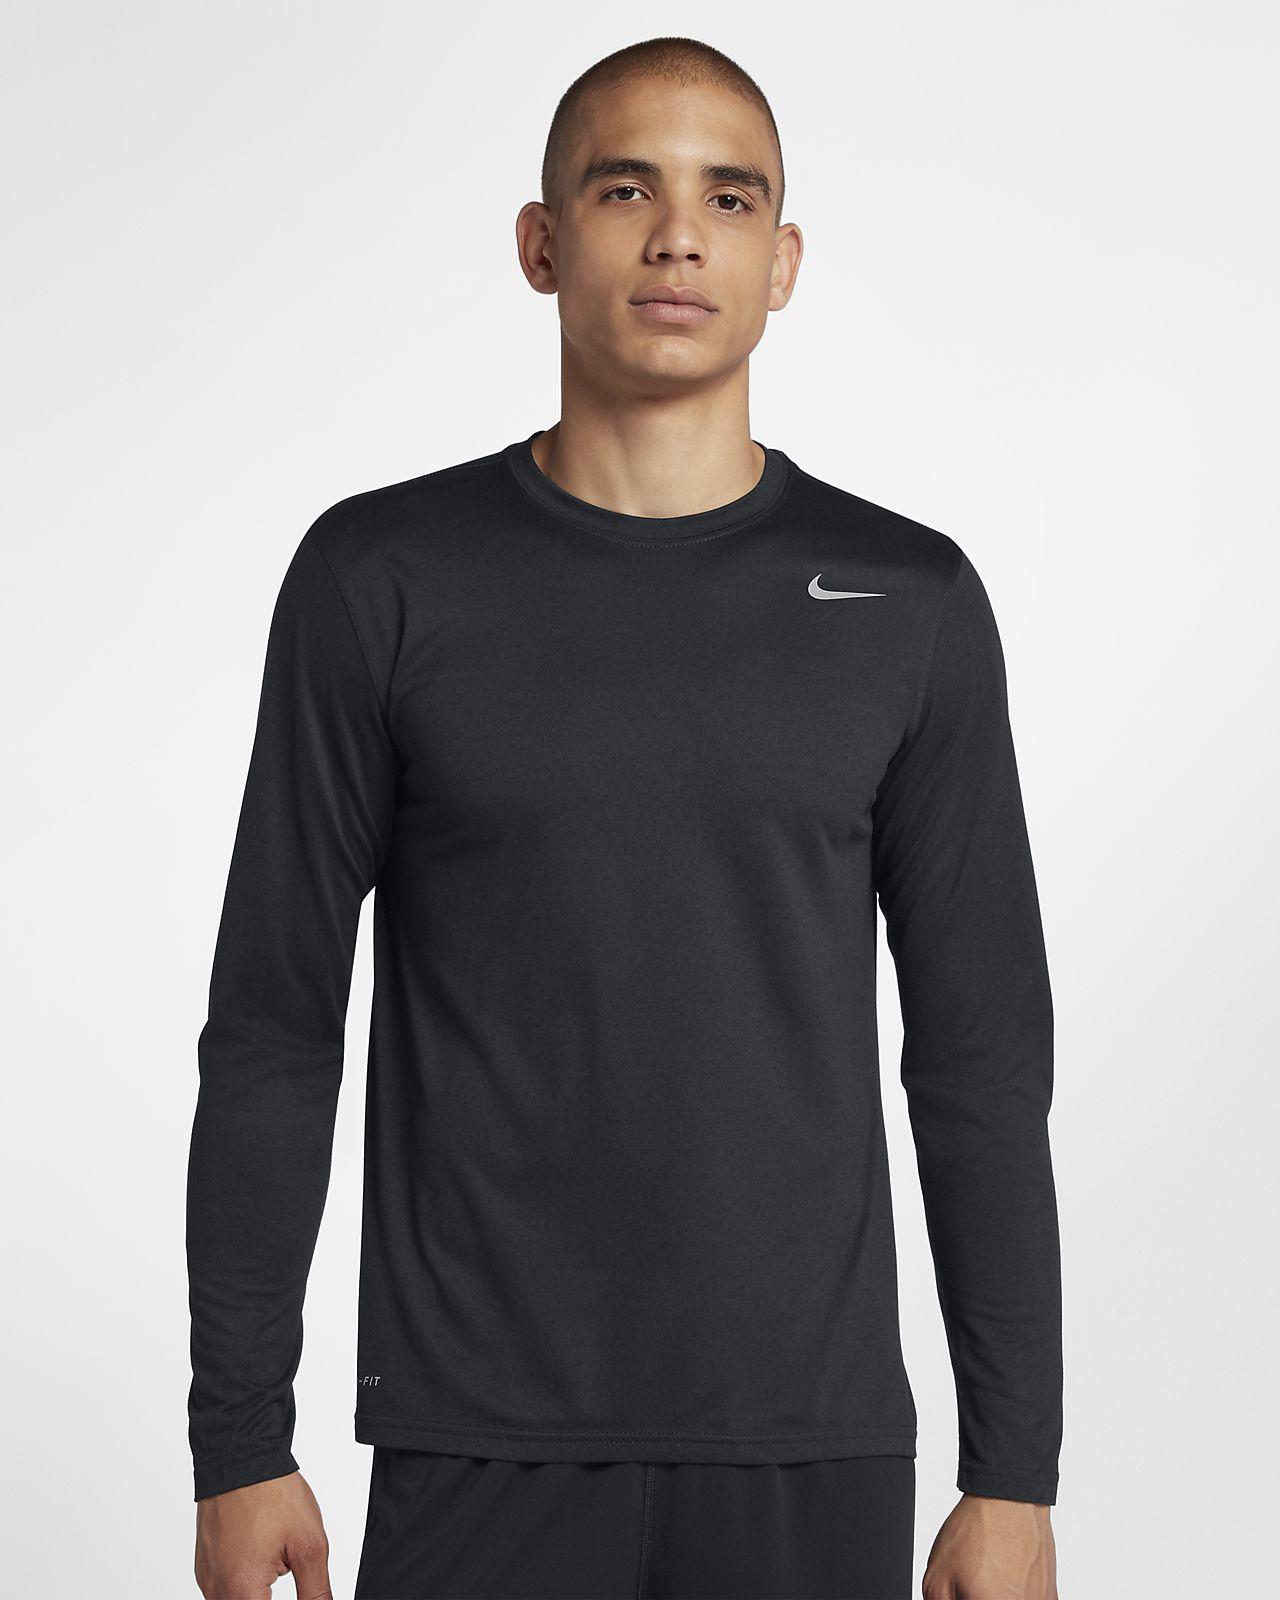 Nike Dri FIT Legend 2.0 Men's Long Sleeve Training Top